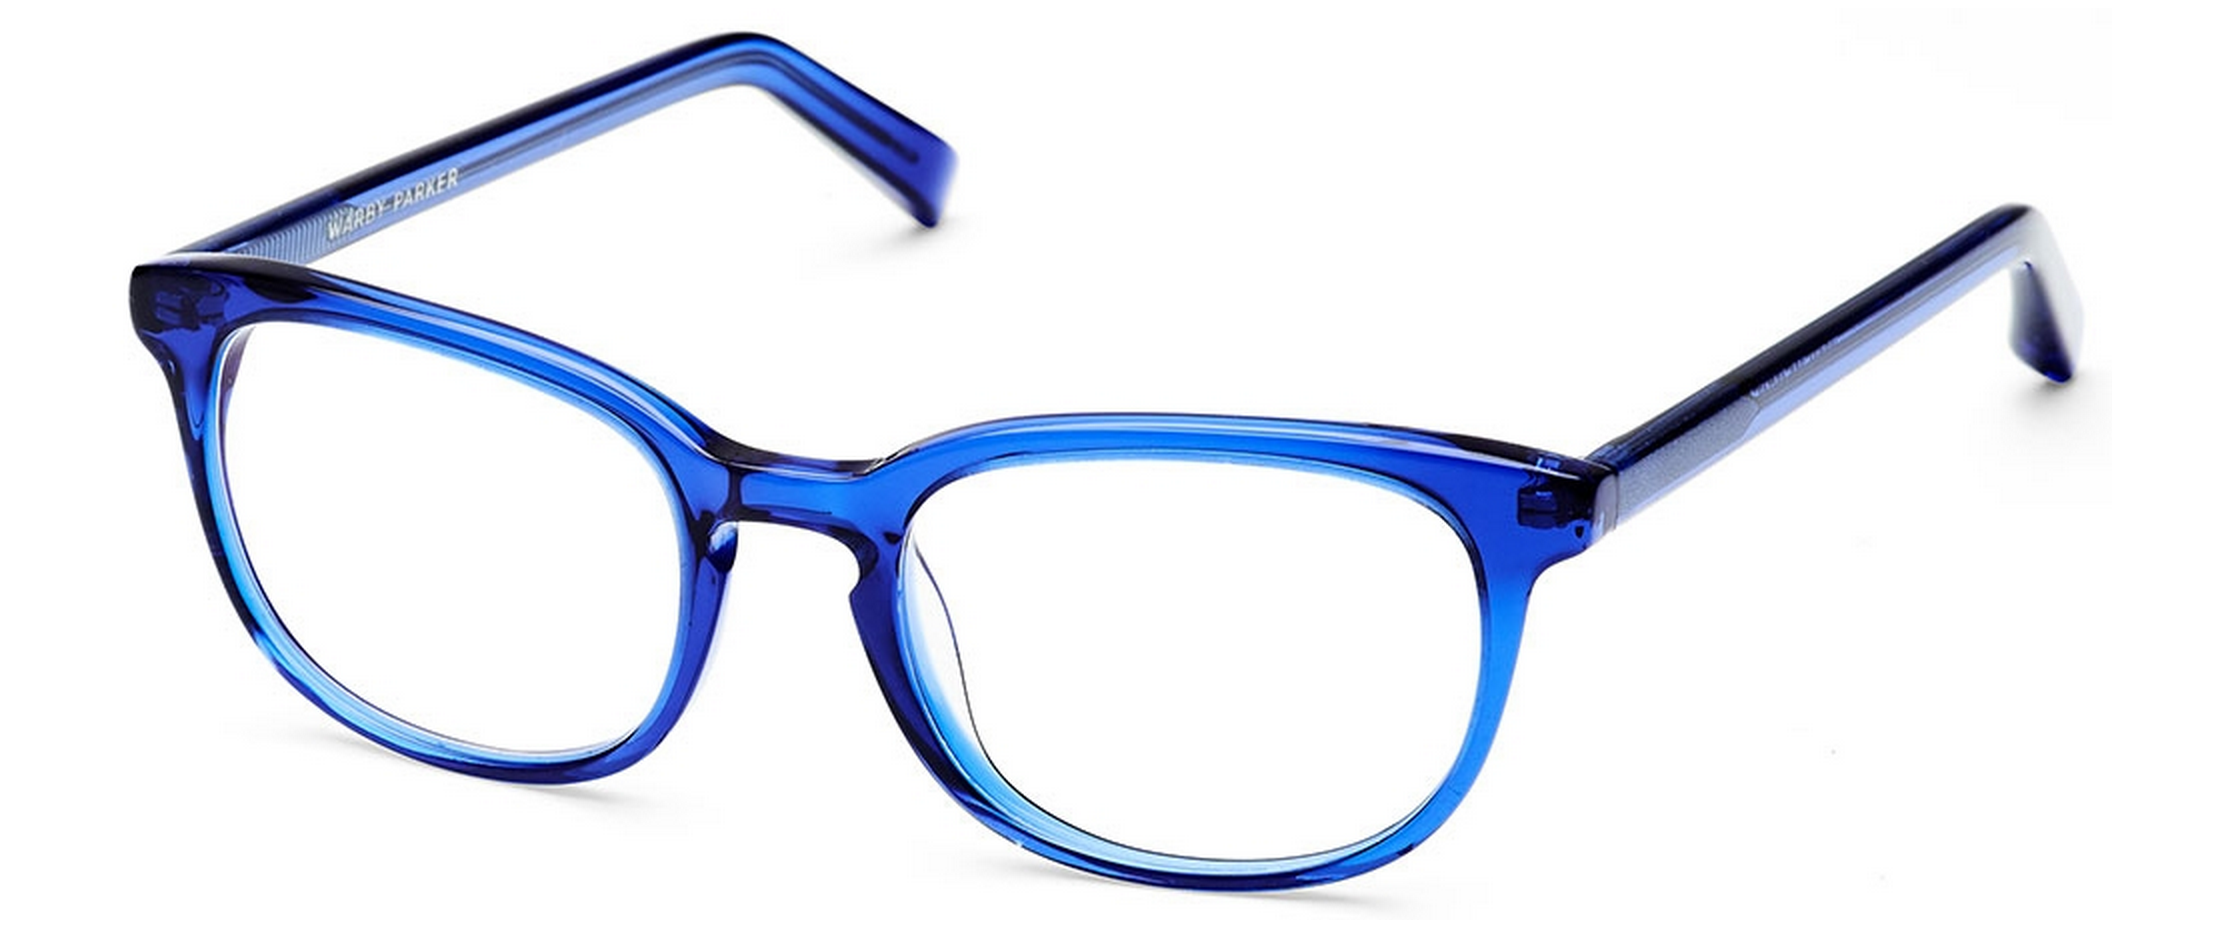 Custom-made models acetate optical frames. Choose the model you like ...